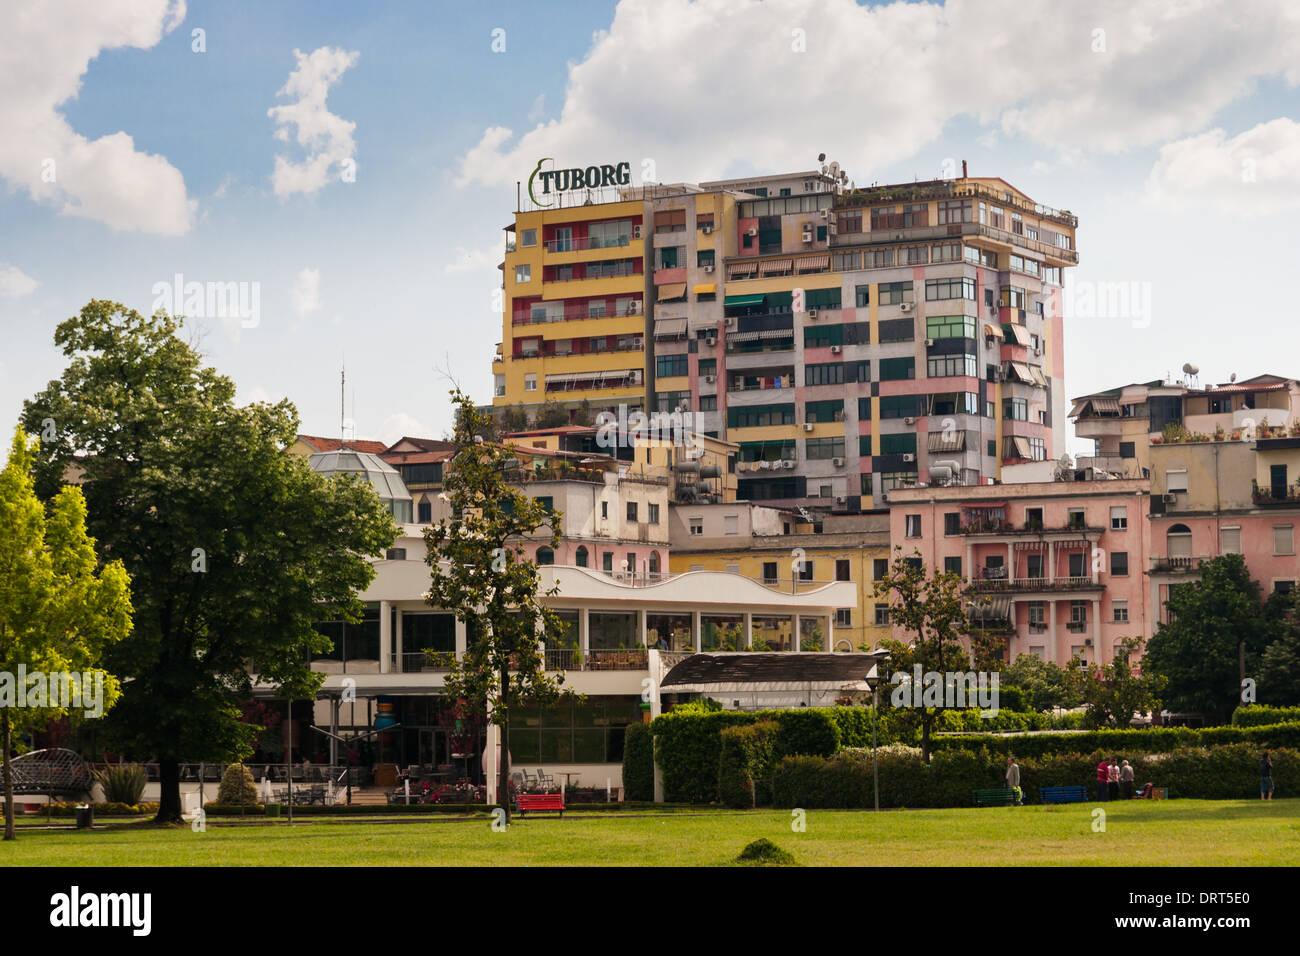 Building in the center of tirana, albania - Stock Image